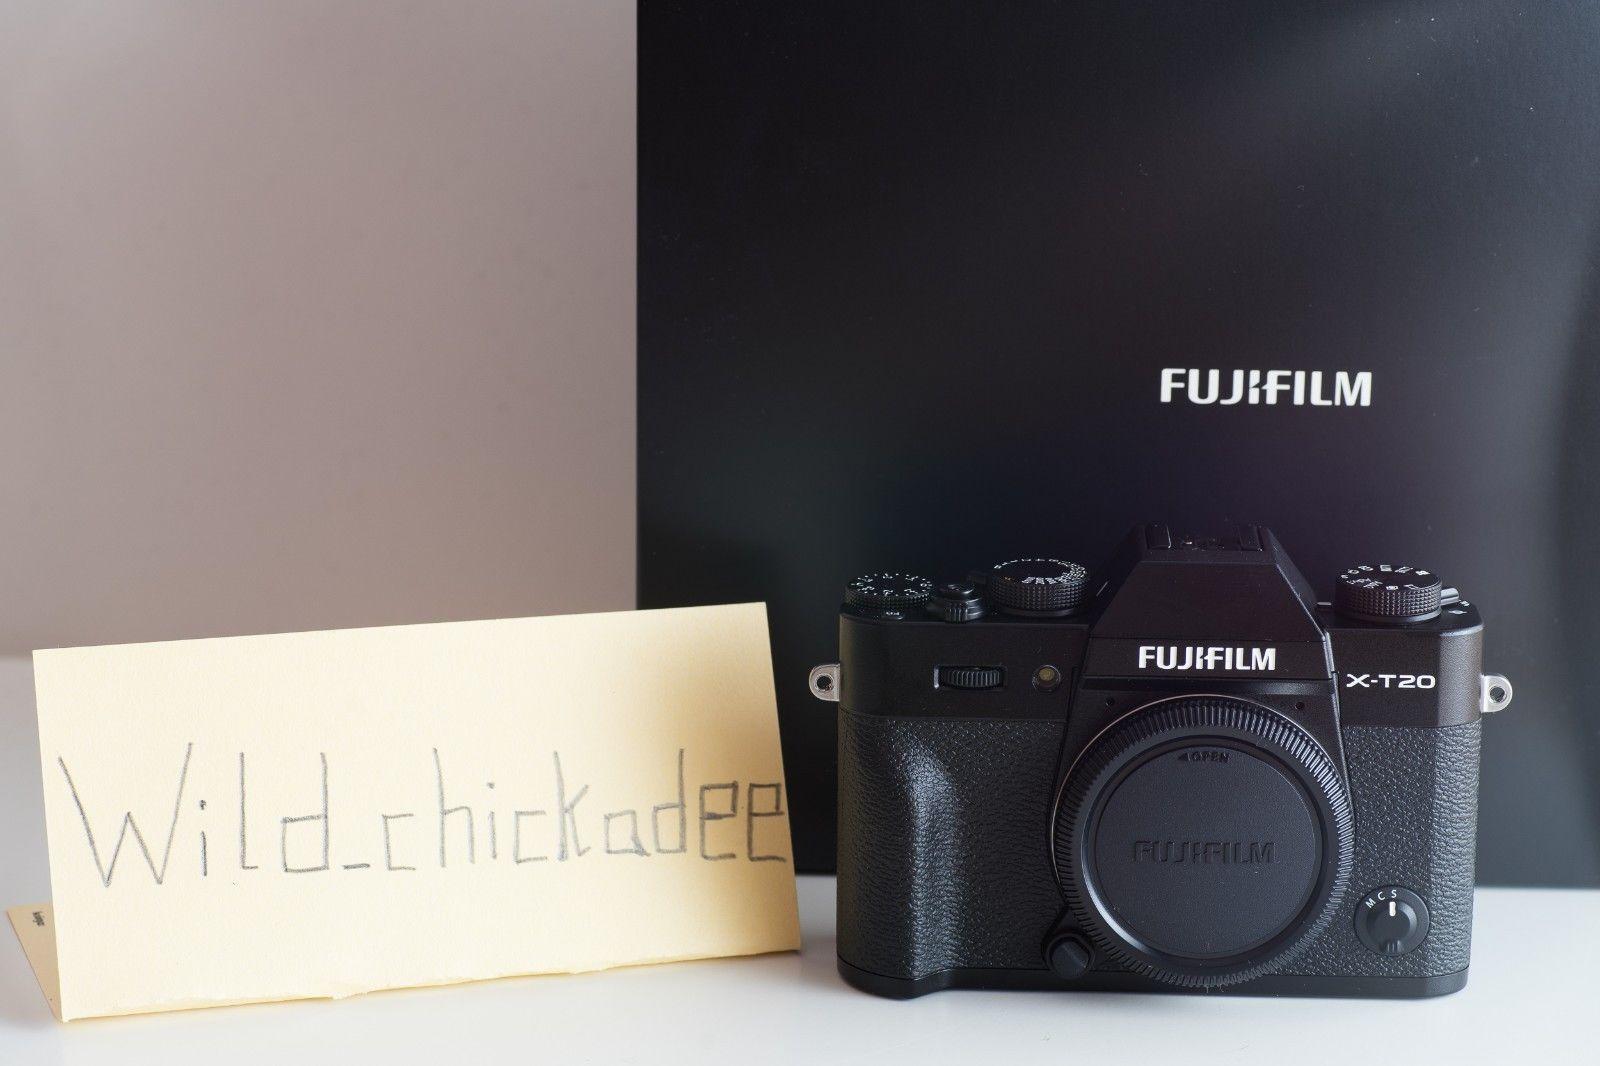 Fujifilm X series X-T20 Digitalkamera - Schwarz, NEU und OVP